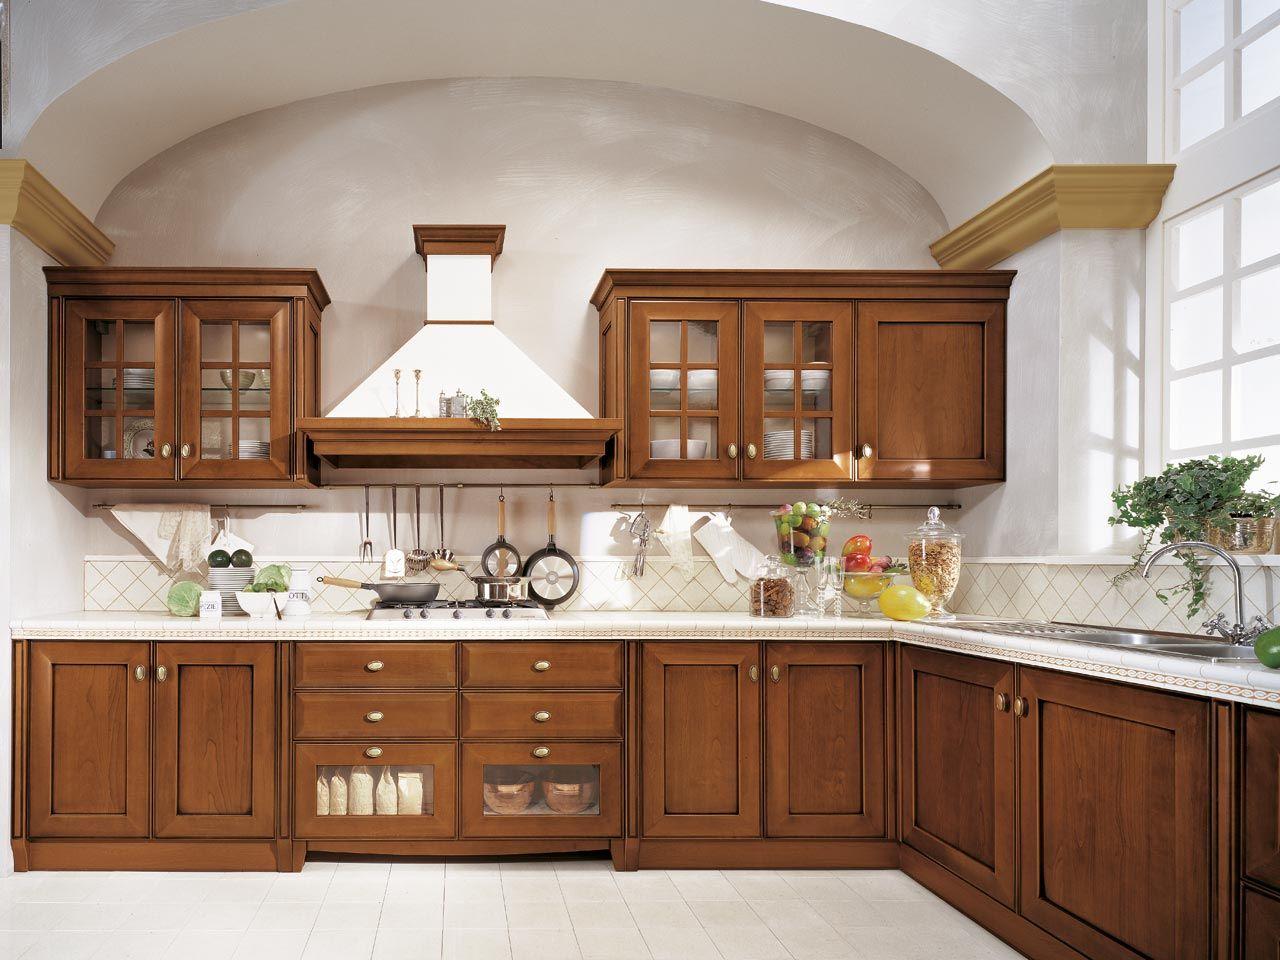 velia ciliegio cuisine en bois massif by cucine lube. Black Bedroom Furniture Sets. Home Design Ideas